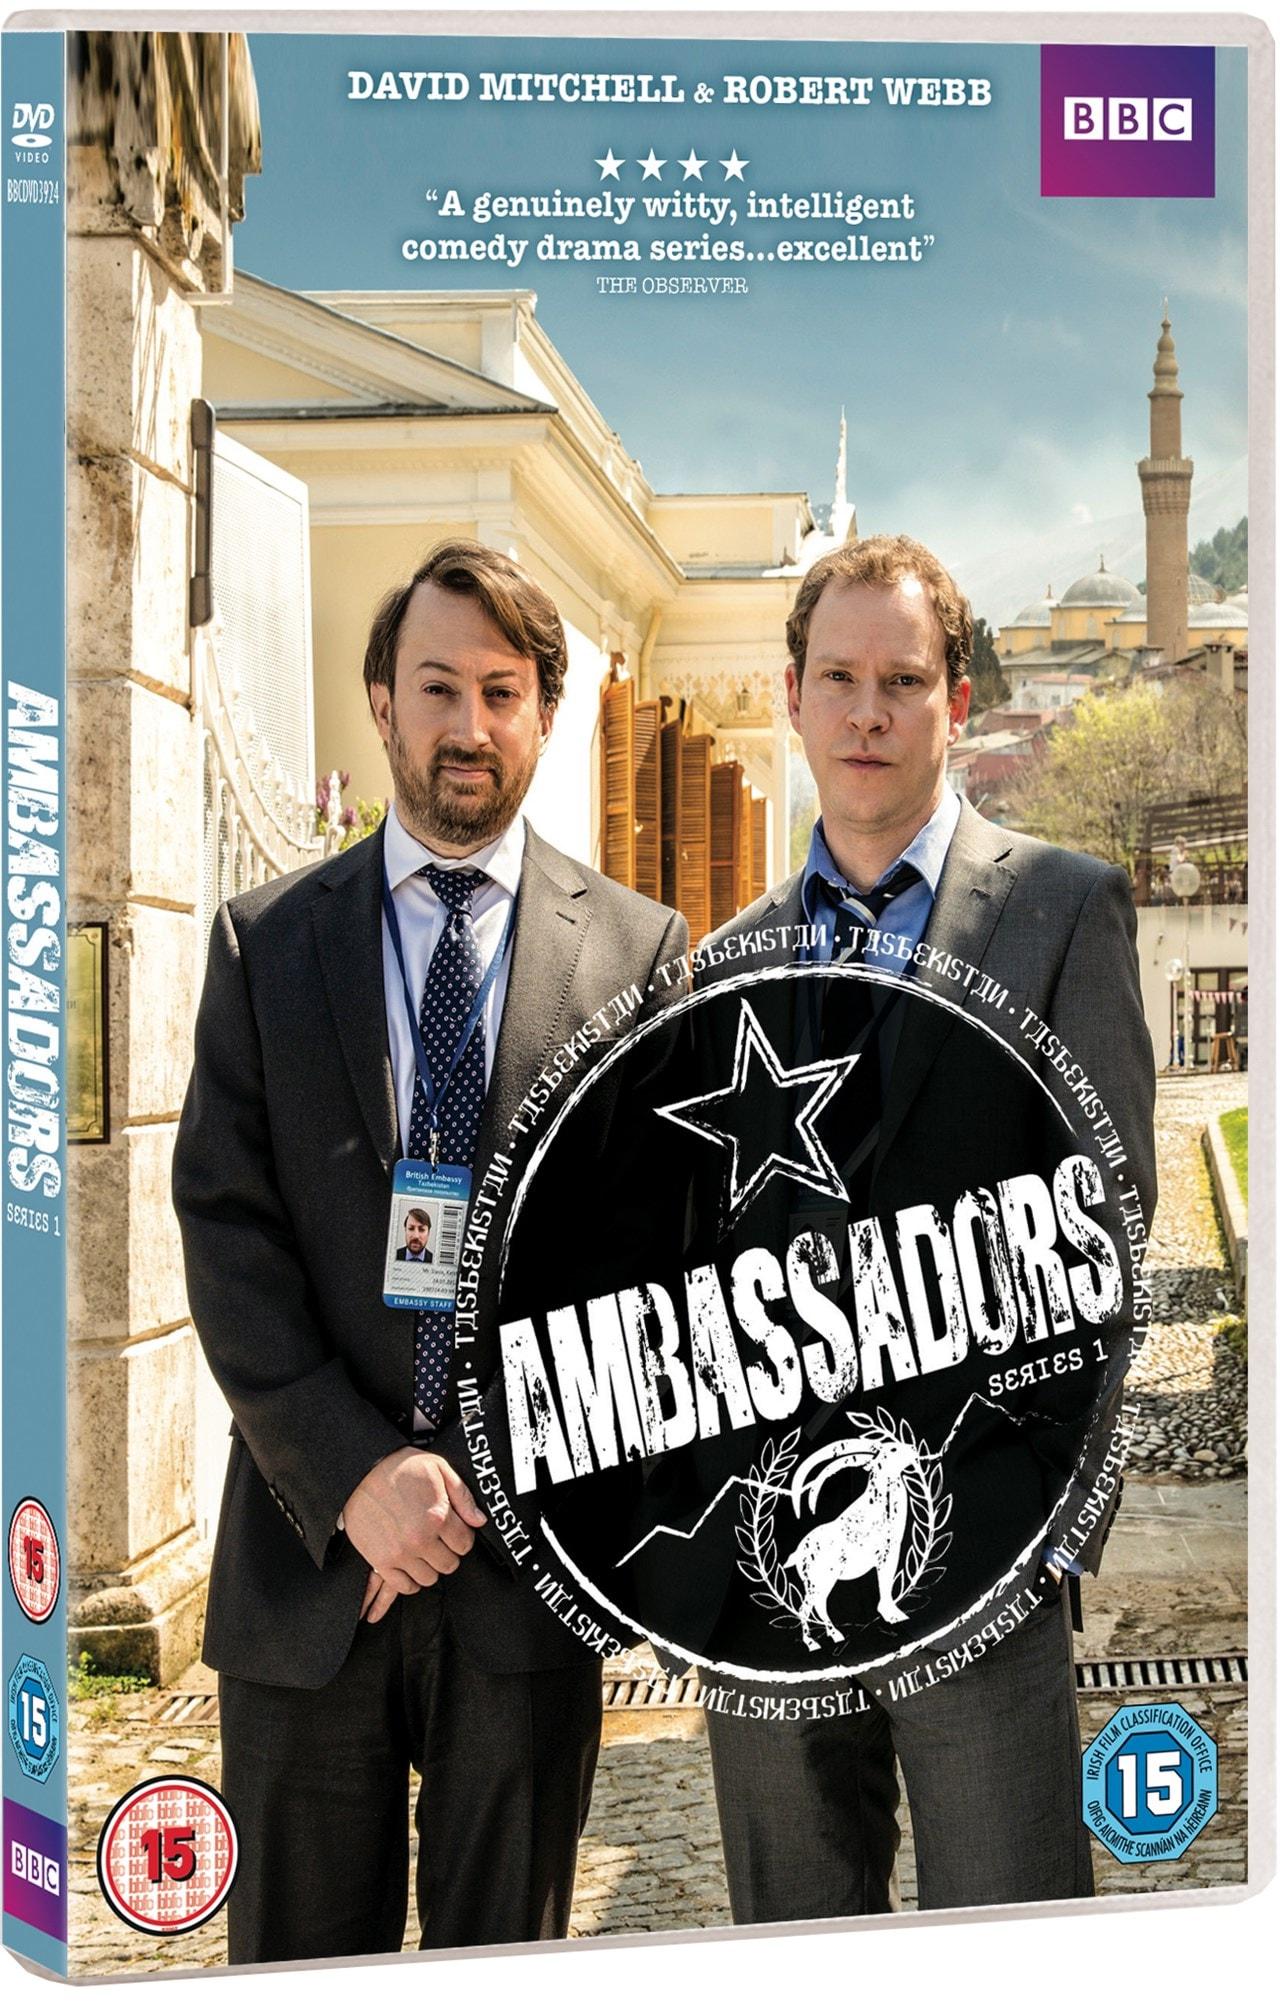 Ambassadors: Series 1 - 2